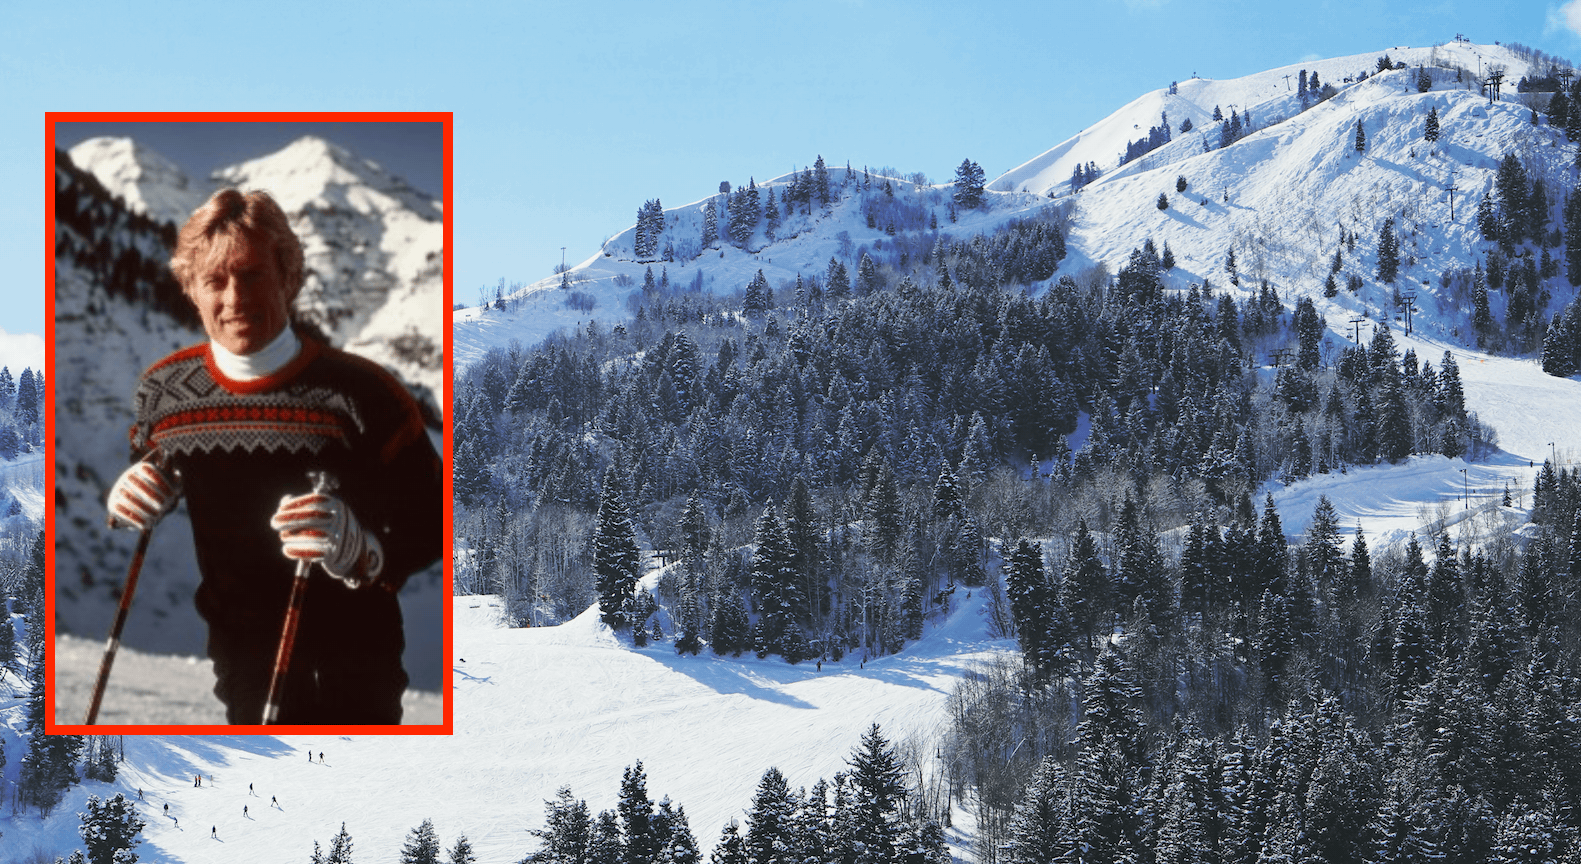 Robert redfors, Sundance mountain resort, utah